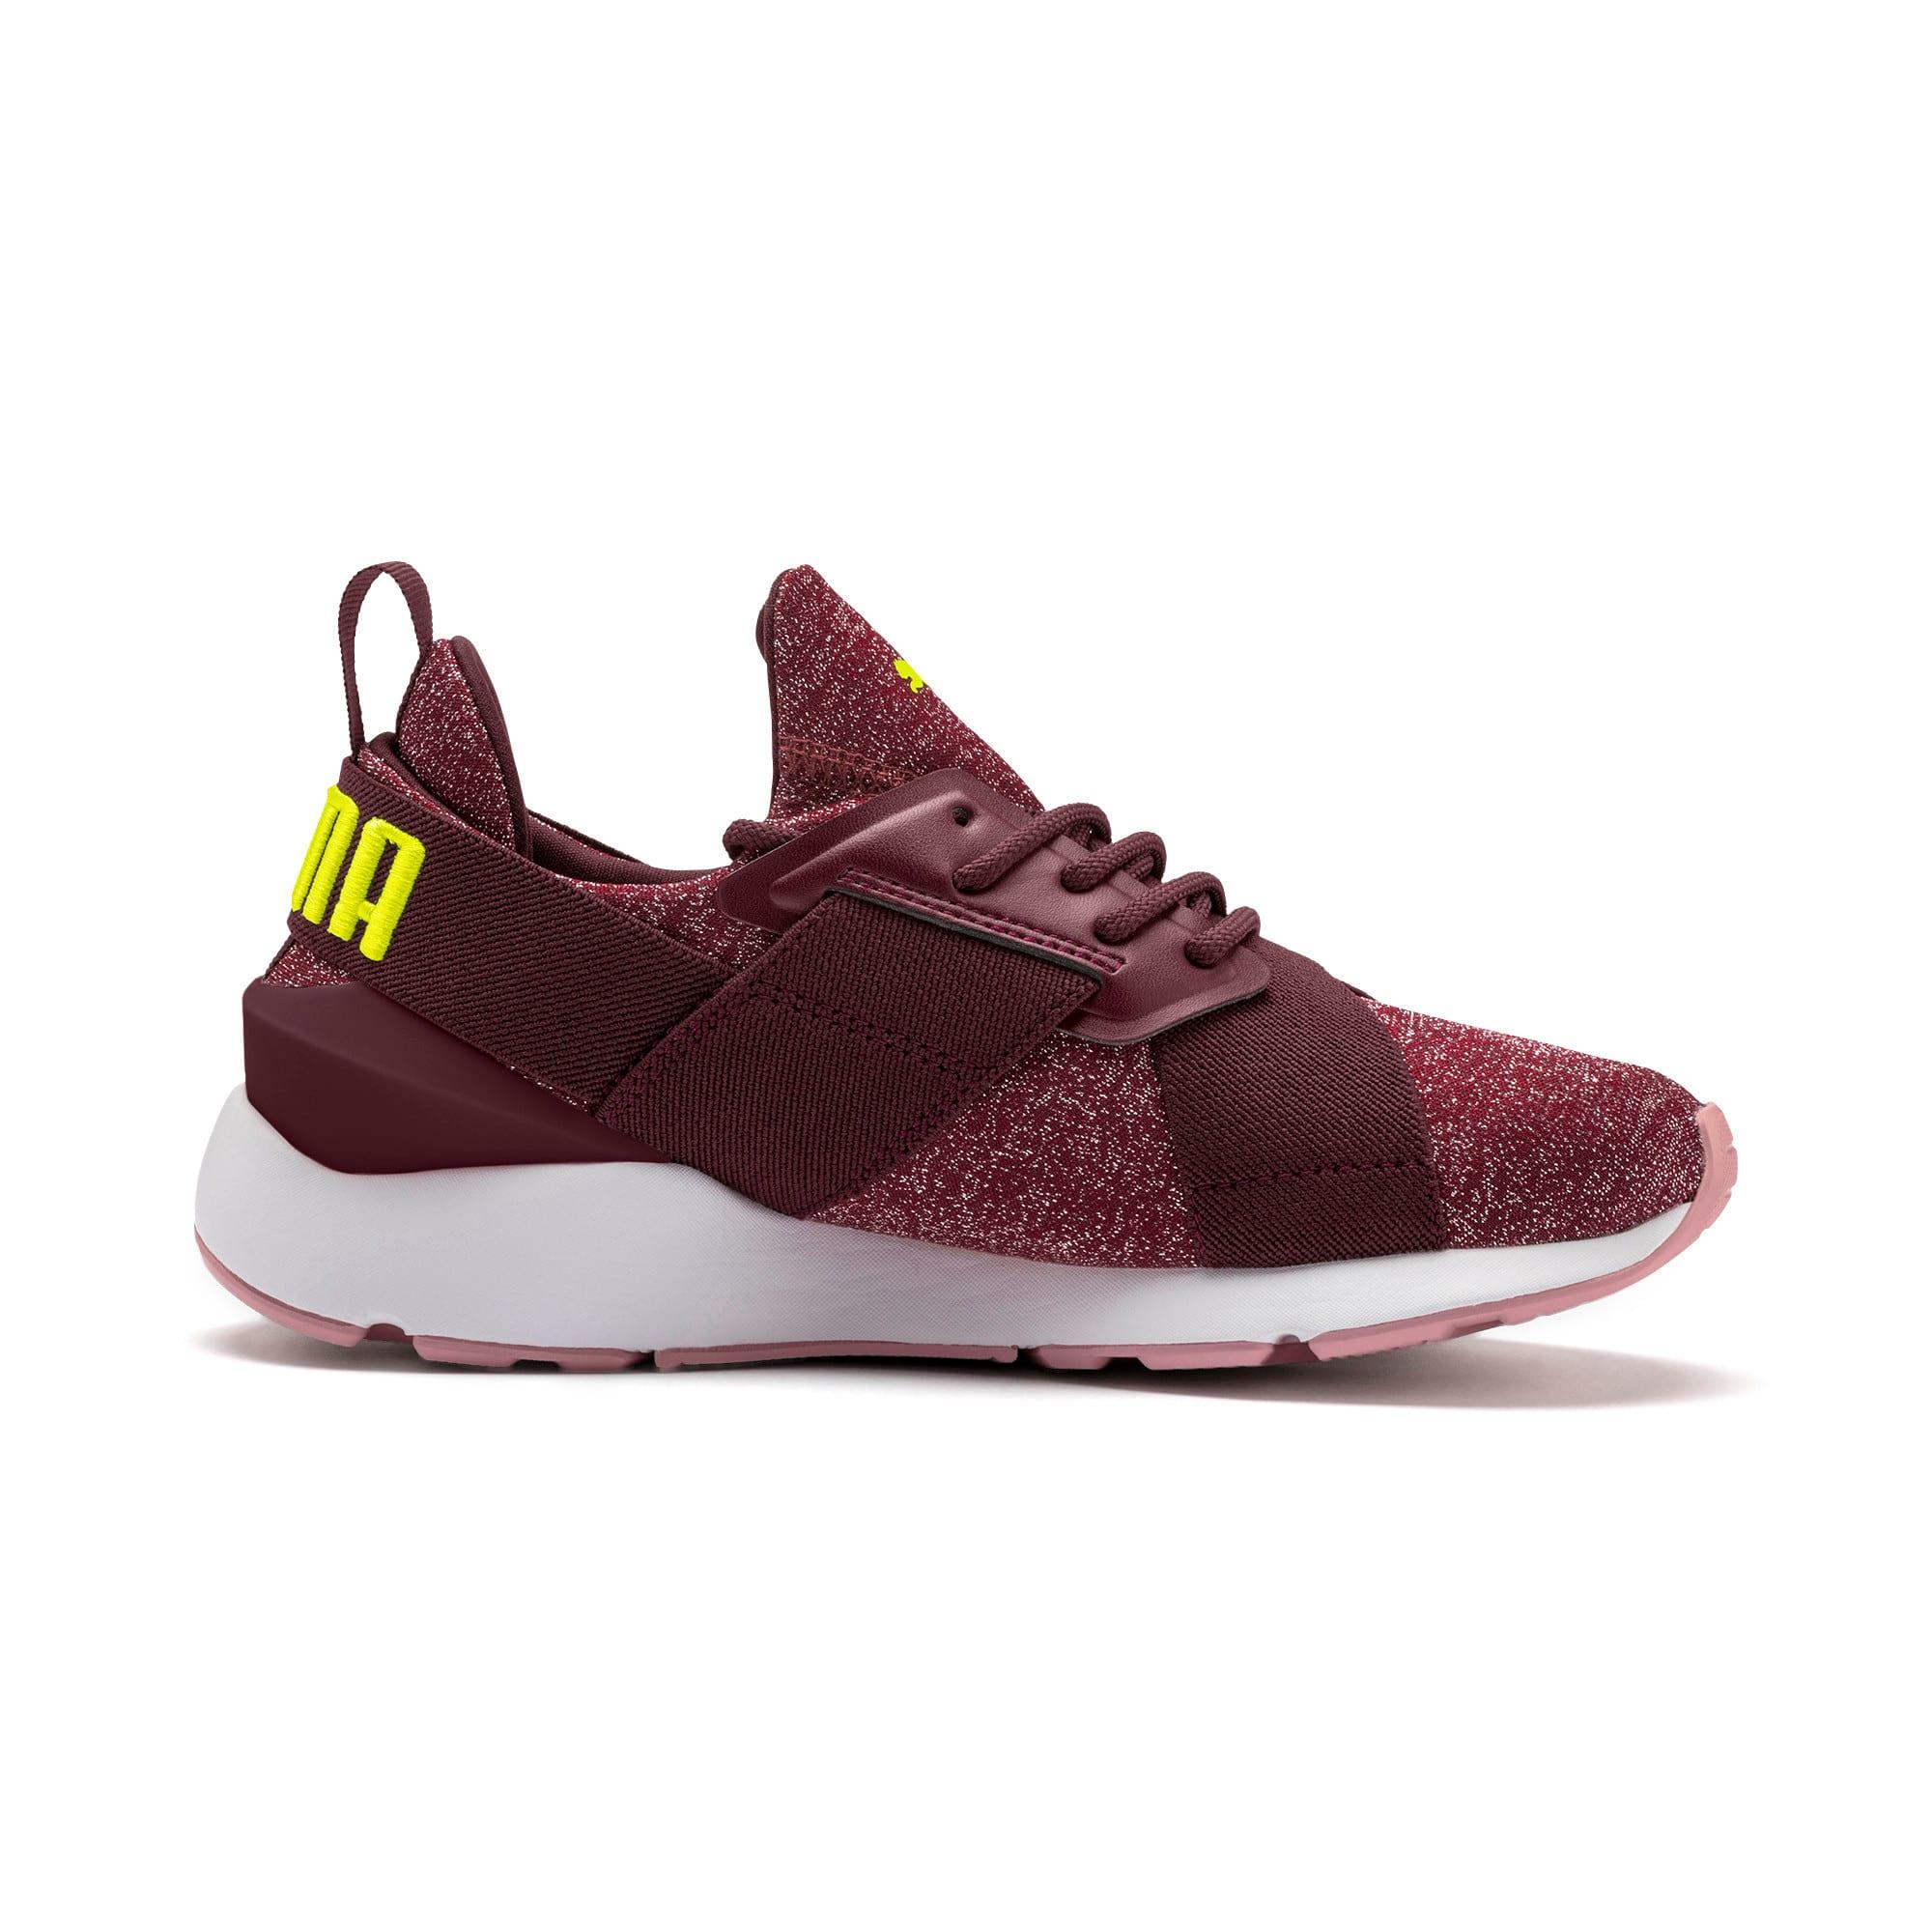 Thumbnail 5 of Muse Shift Sneakers JR, Vineyard Wine-Yellow Alert, medium